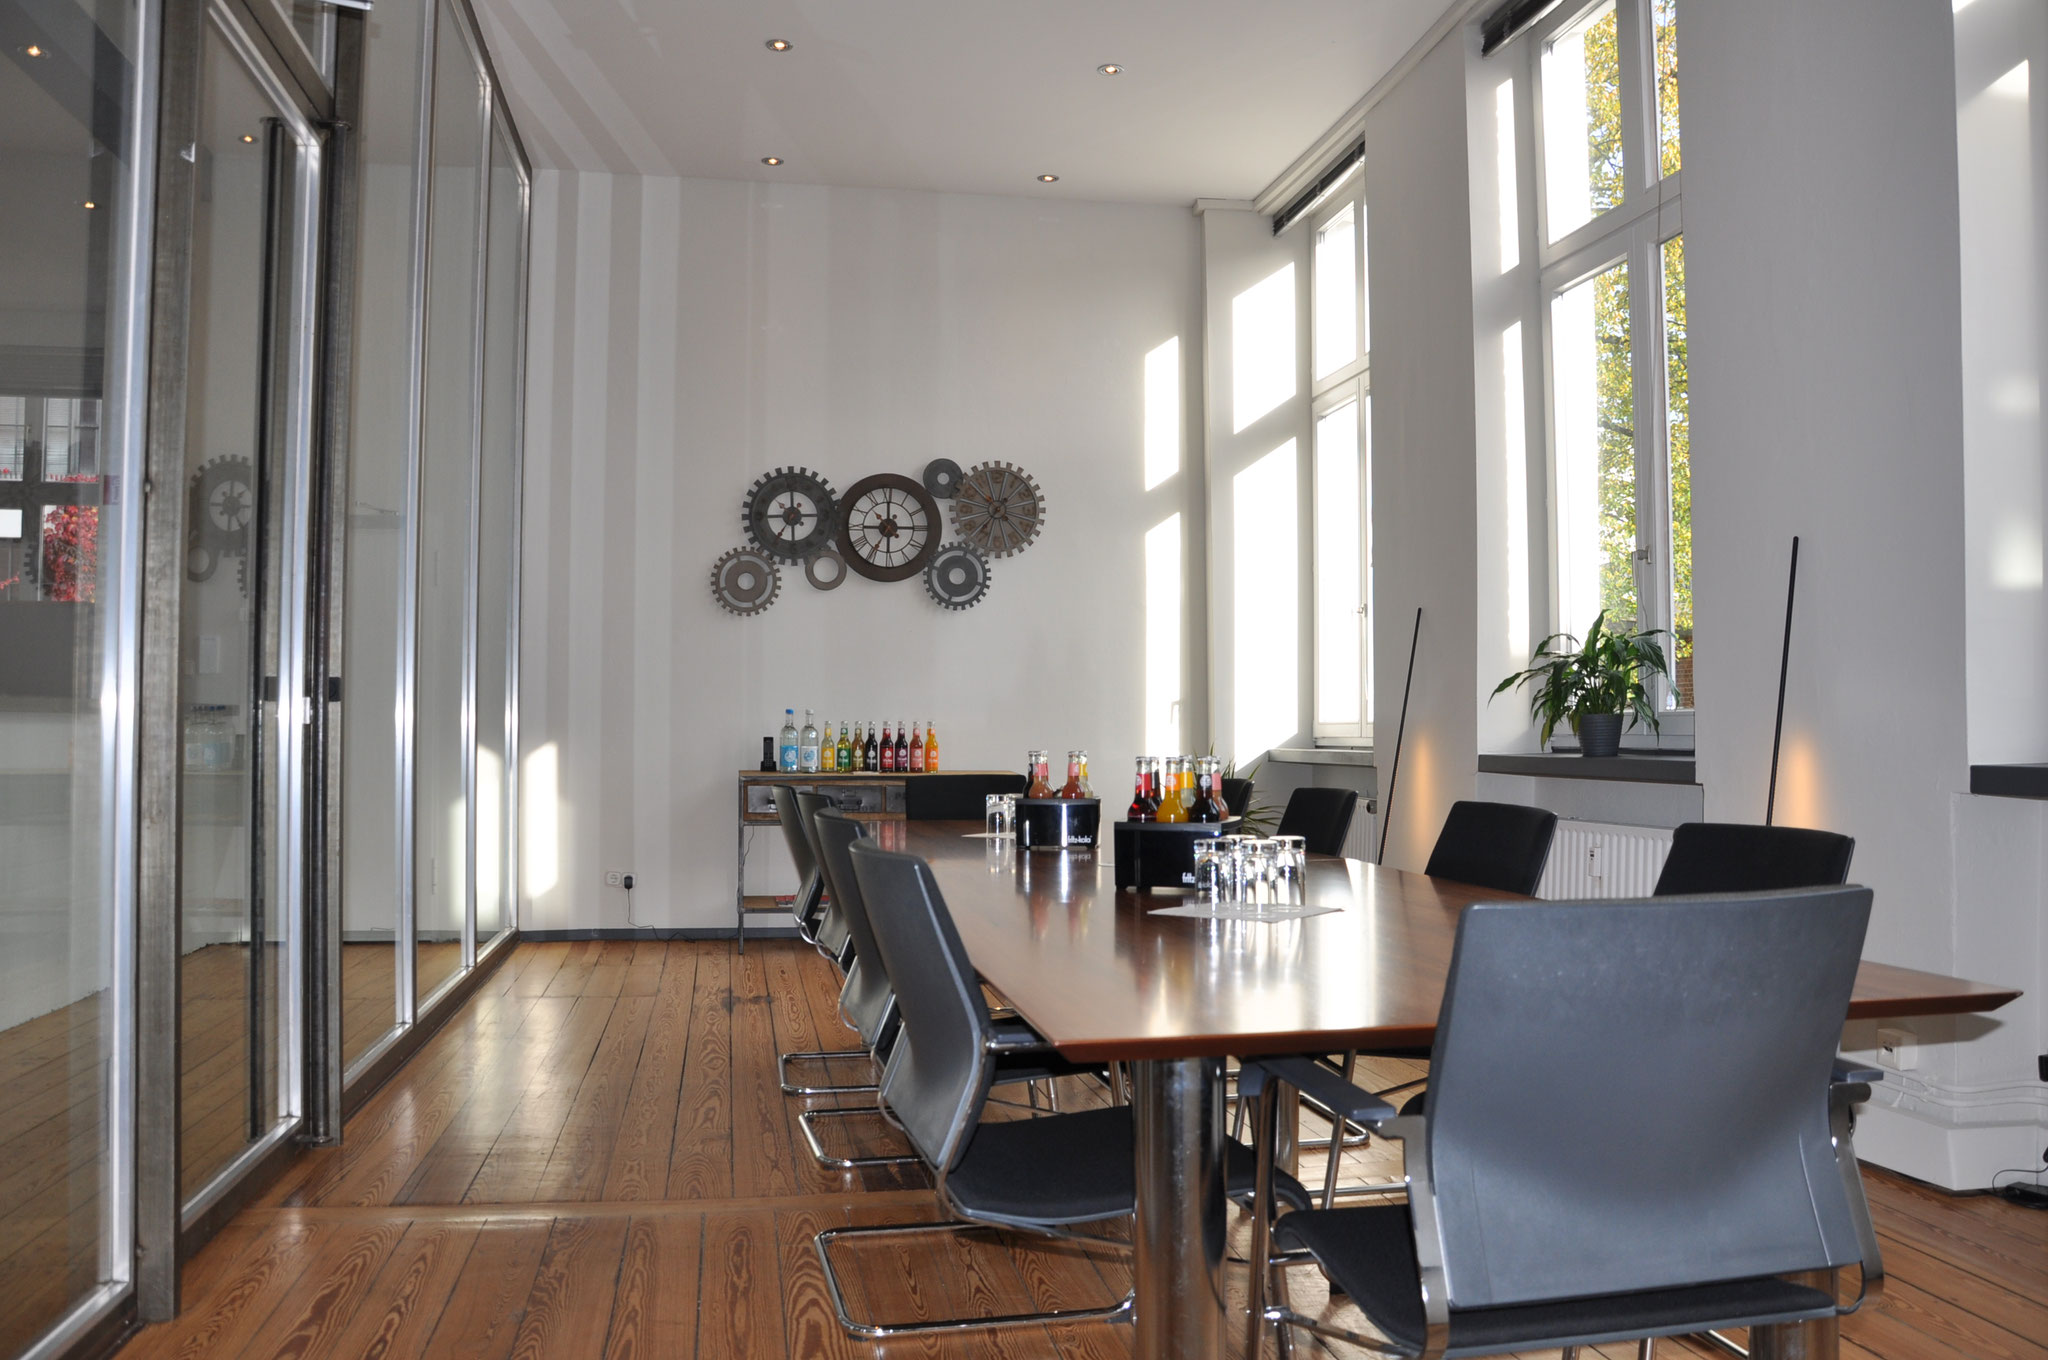 Büro-Loft - Großraumbüro - Die Ferberei - Home Staging Hamburg